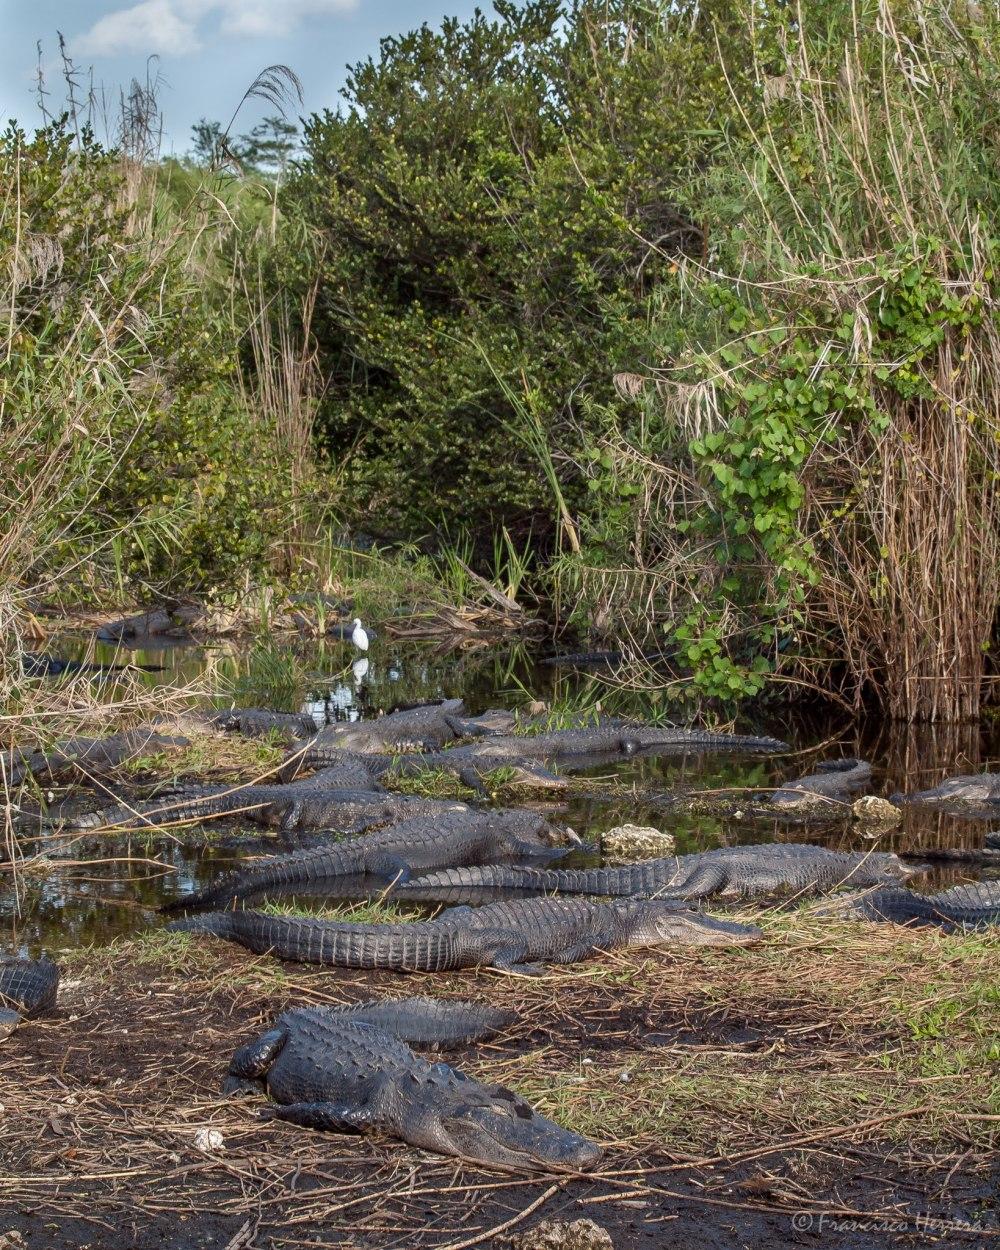 Alligator cove